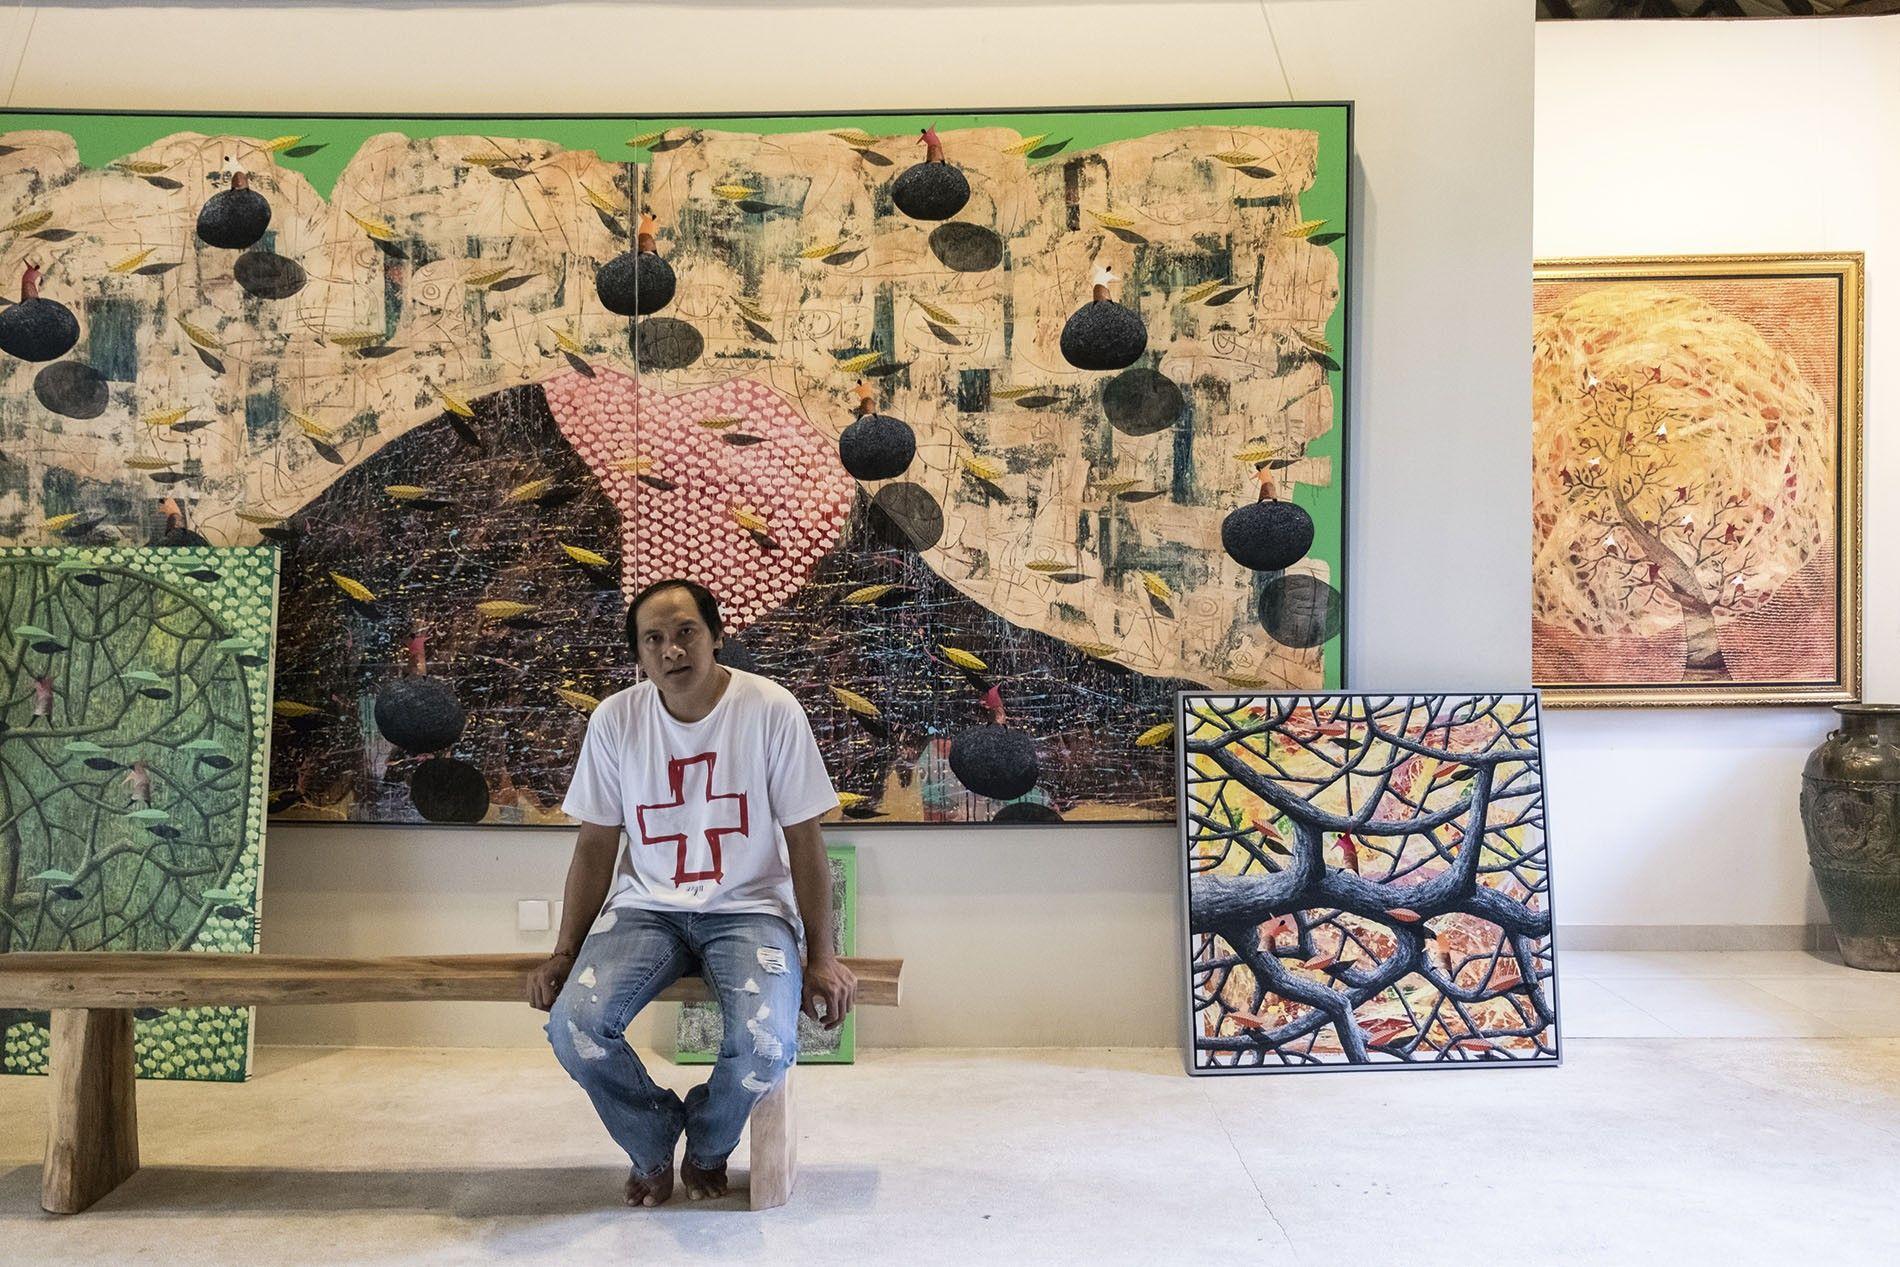 Kenyem in his gallery, Sayan.